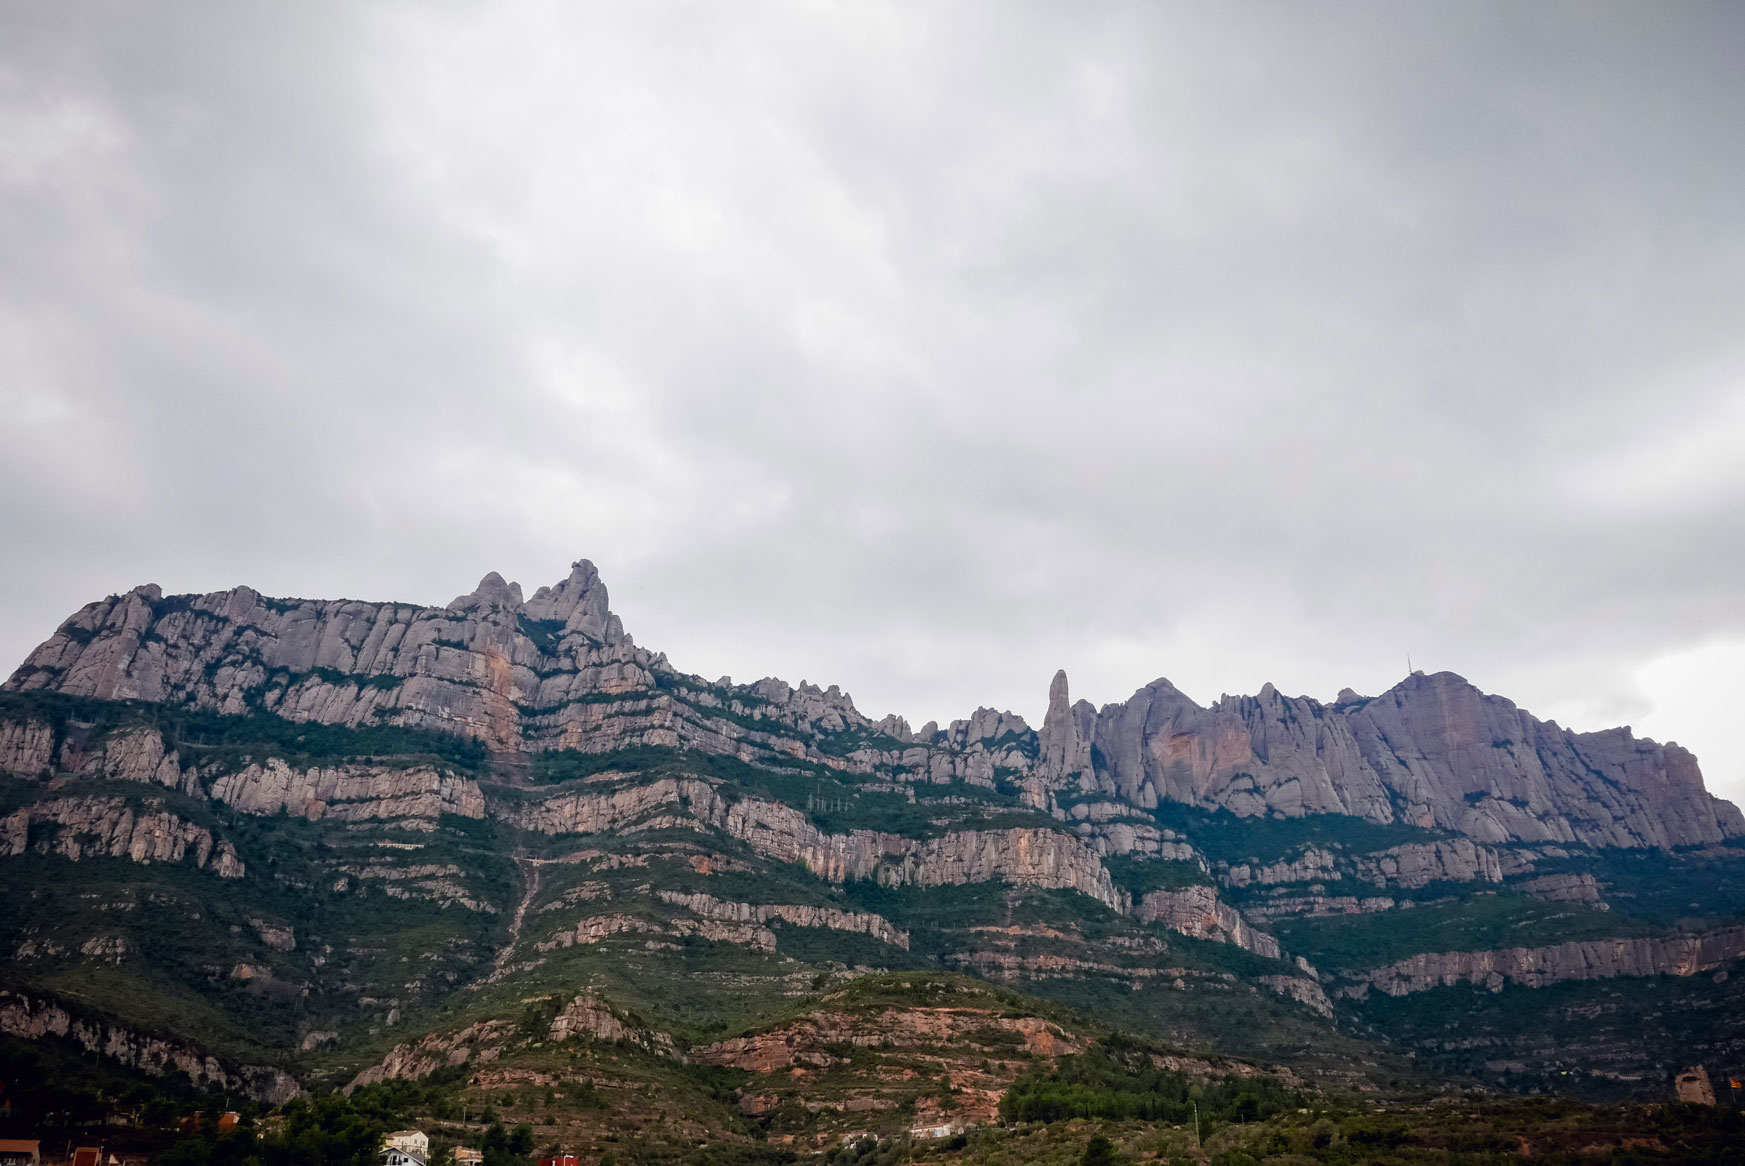 Spain Barcelona Montserrat Monastery from bottom